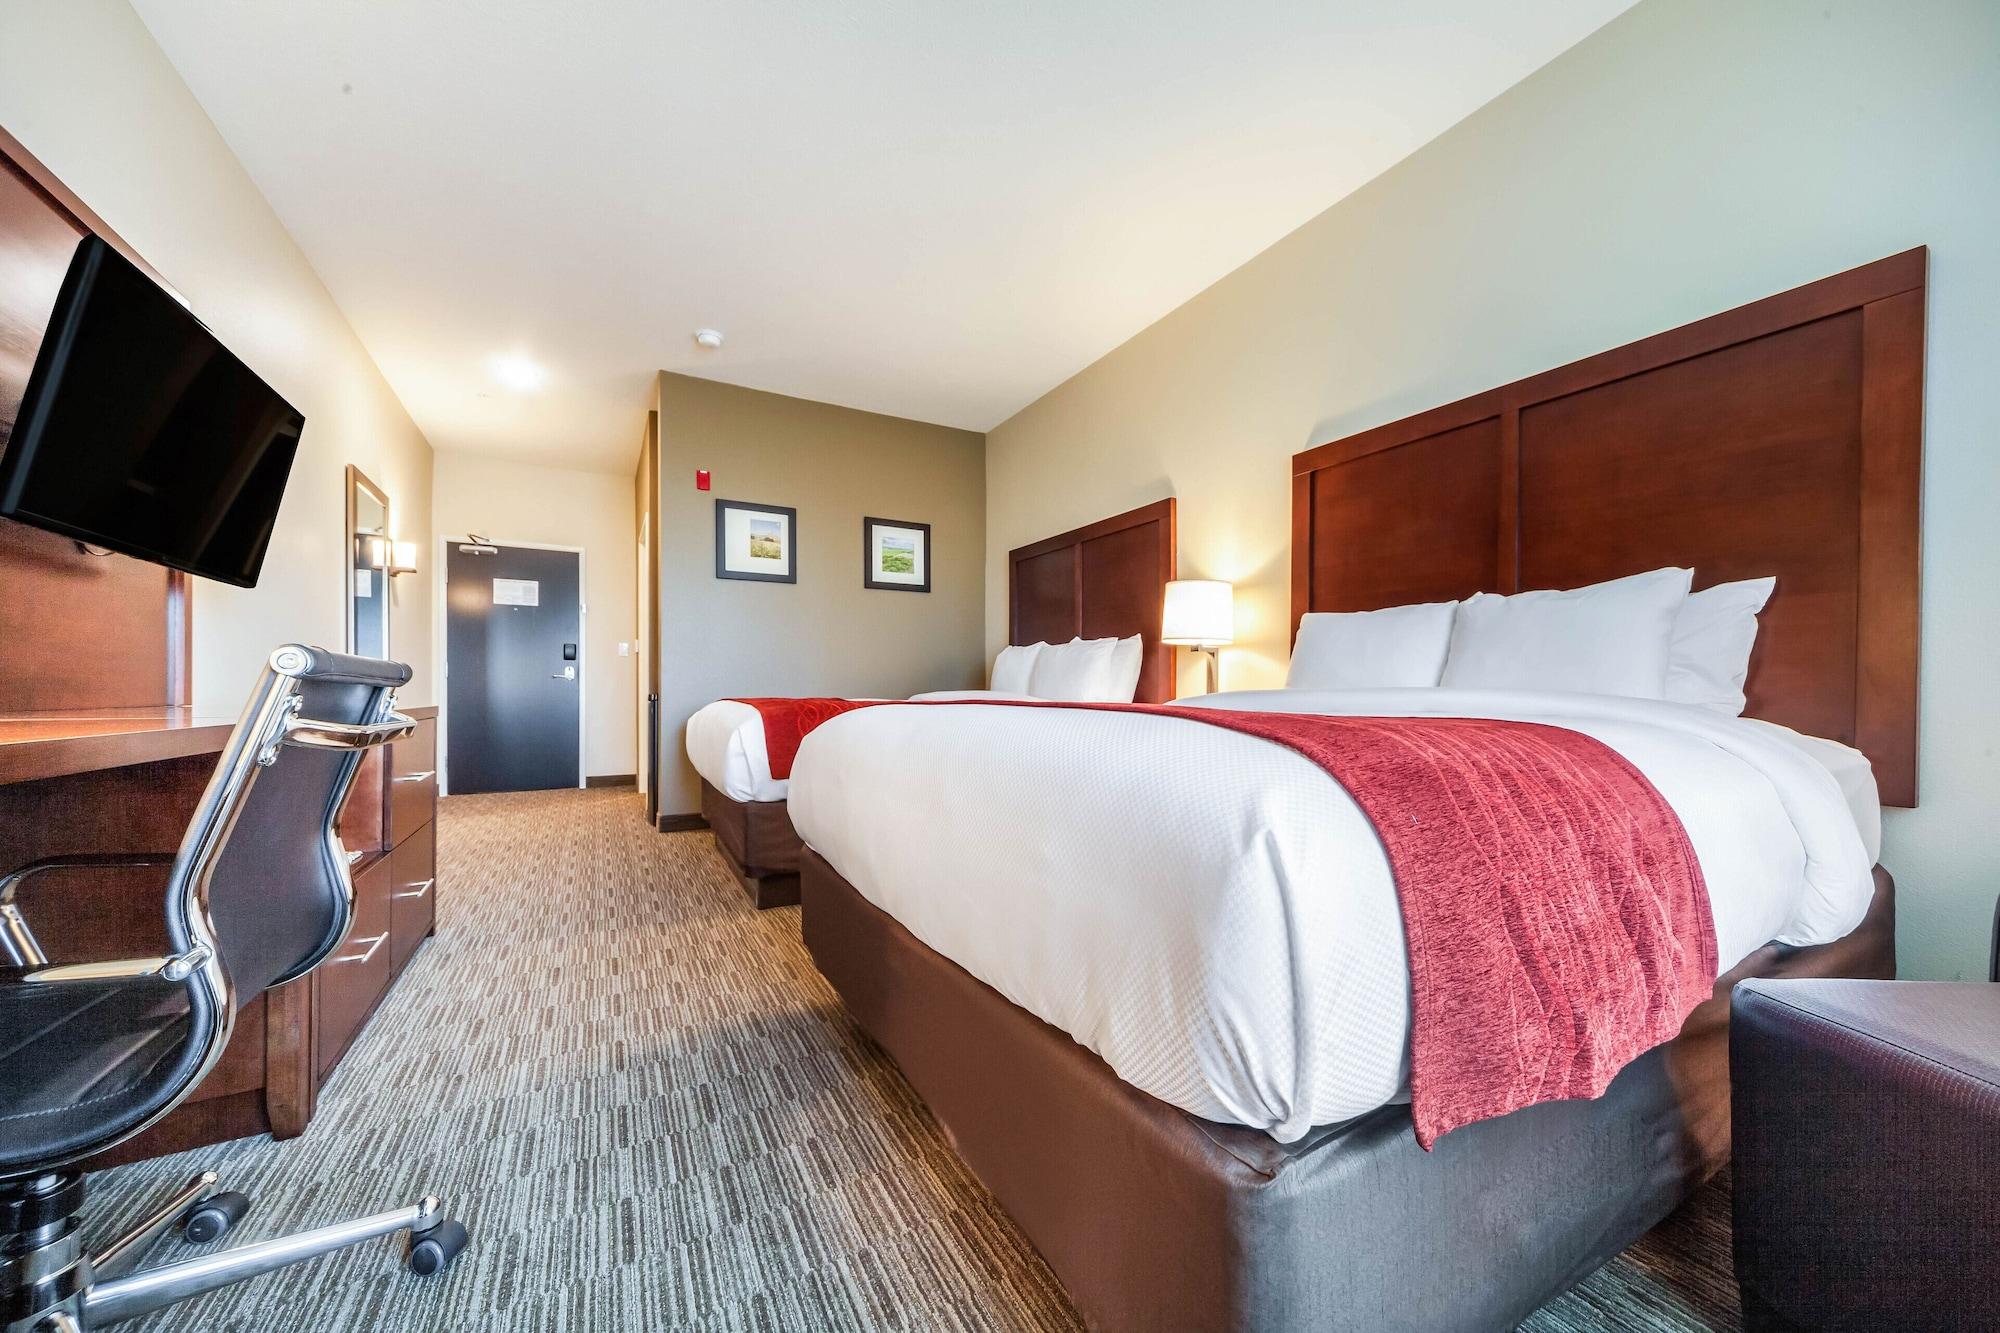 Comfort Inn & Suites, Lincoln